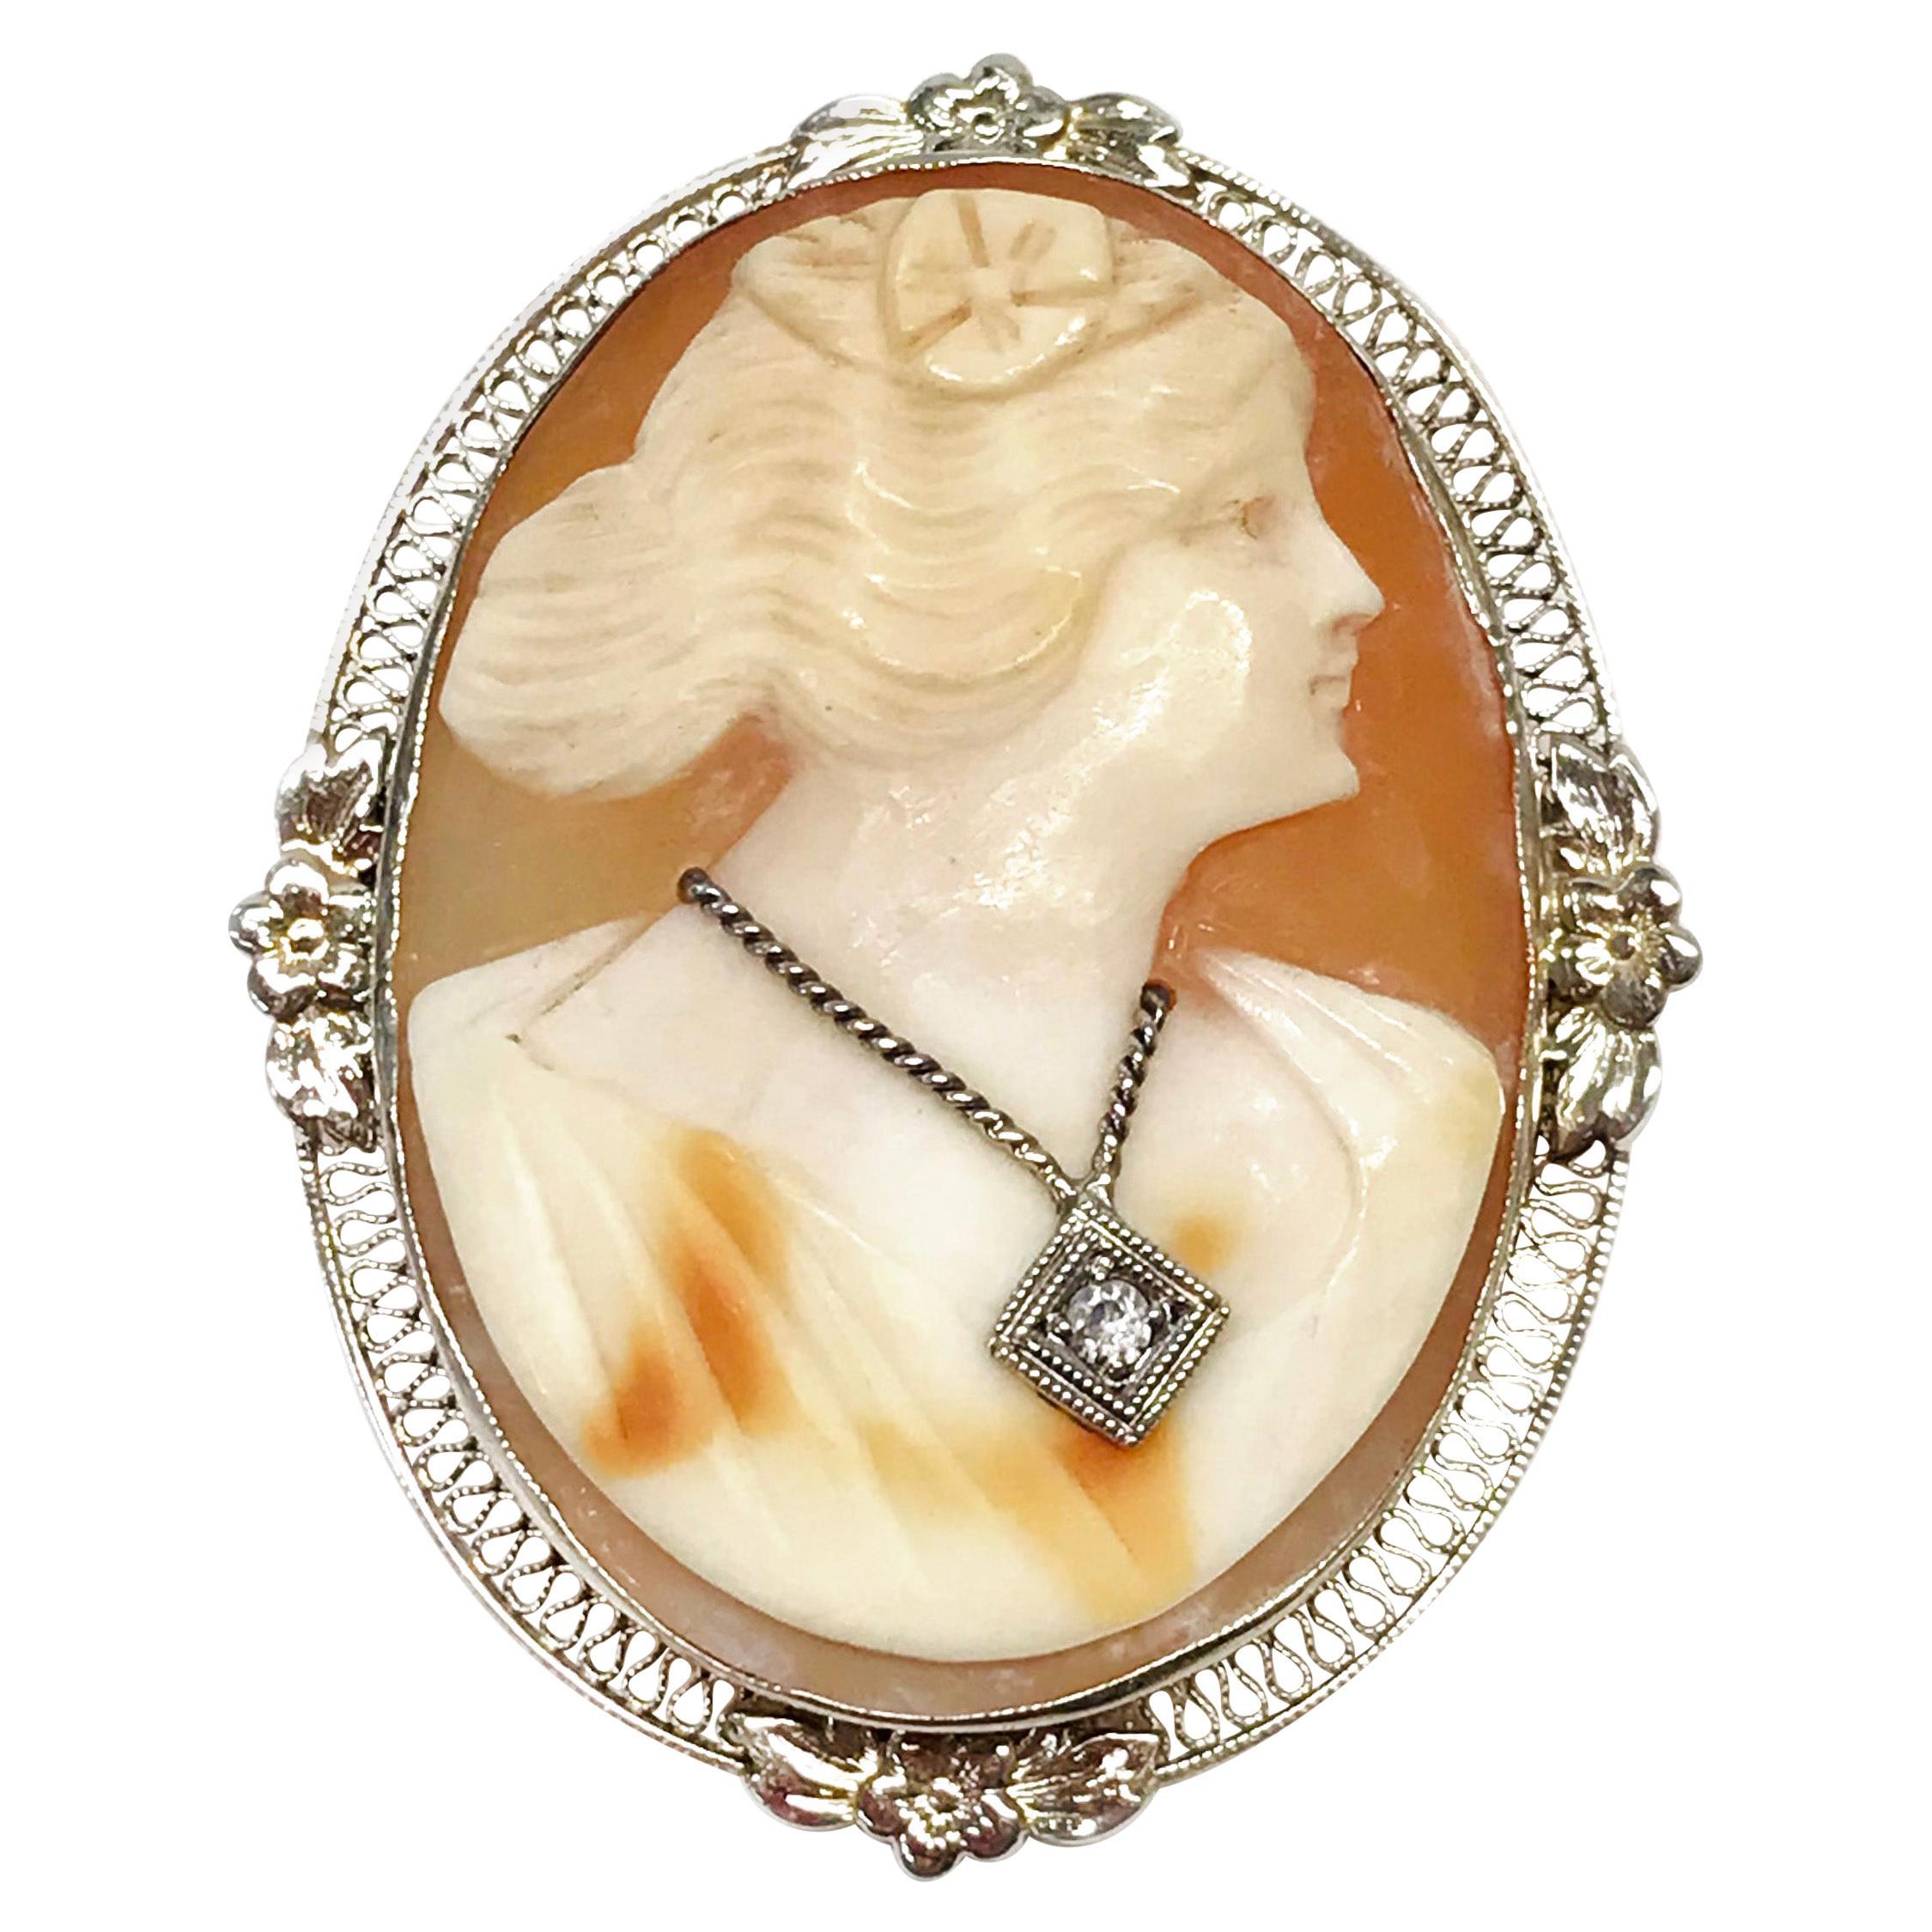 Art Deco 14 Karat Cameo Diamond Pendant Brooch